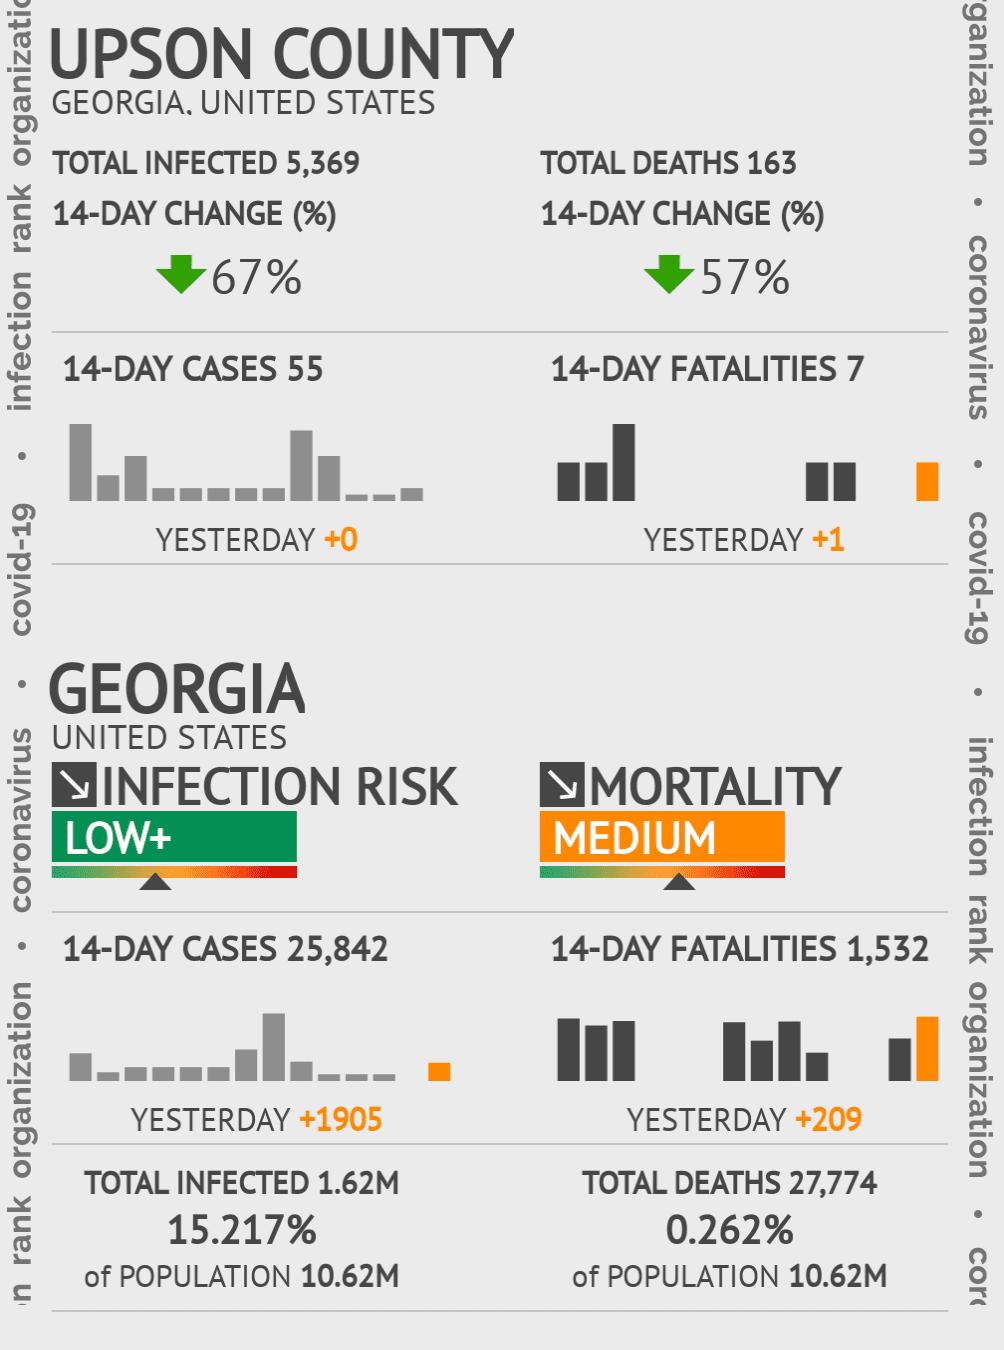 Upson County Coronavirus Covid-19 Risk of Infection on February 25, 2021